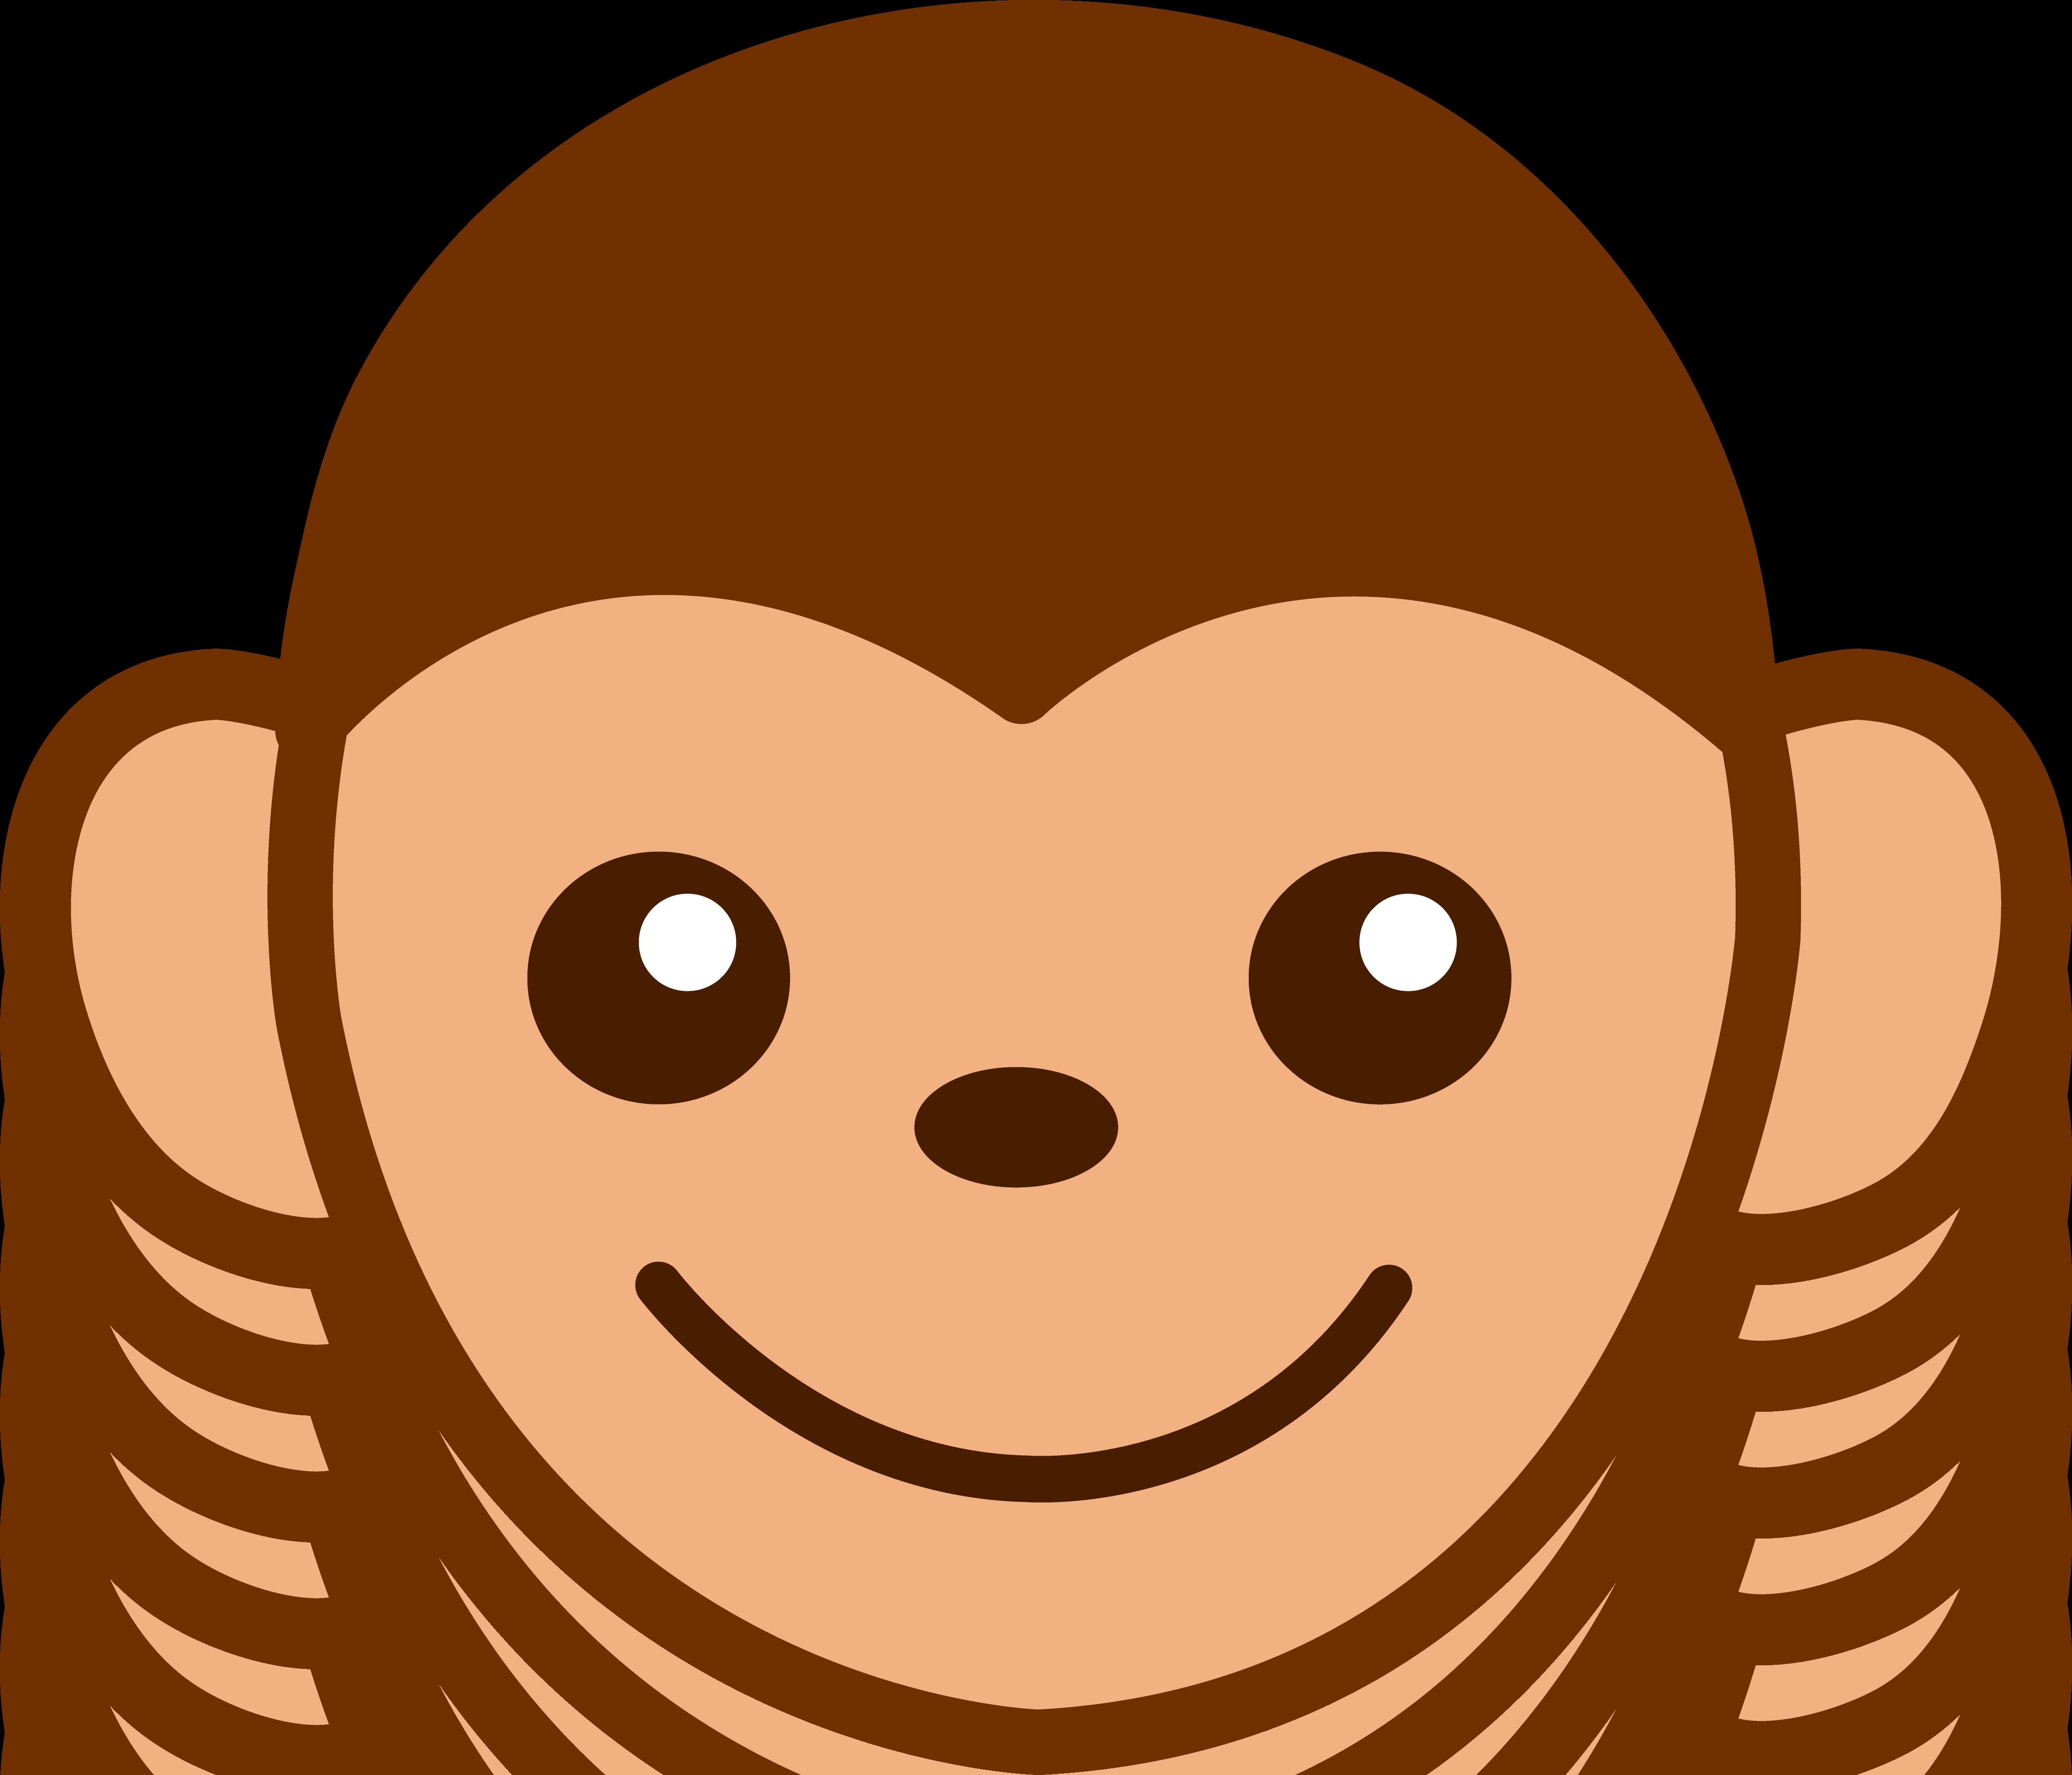 Free Cartoon Monkey Head, Download Free Clip Art, Free Clip.